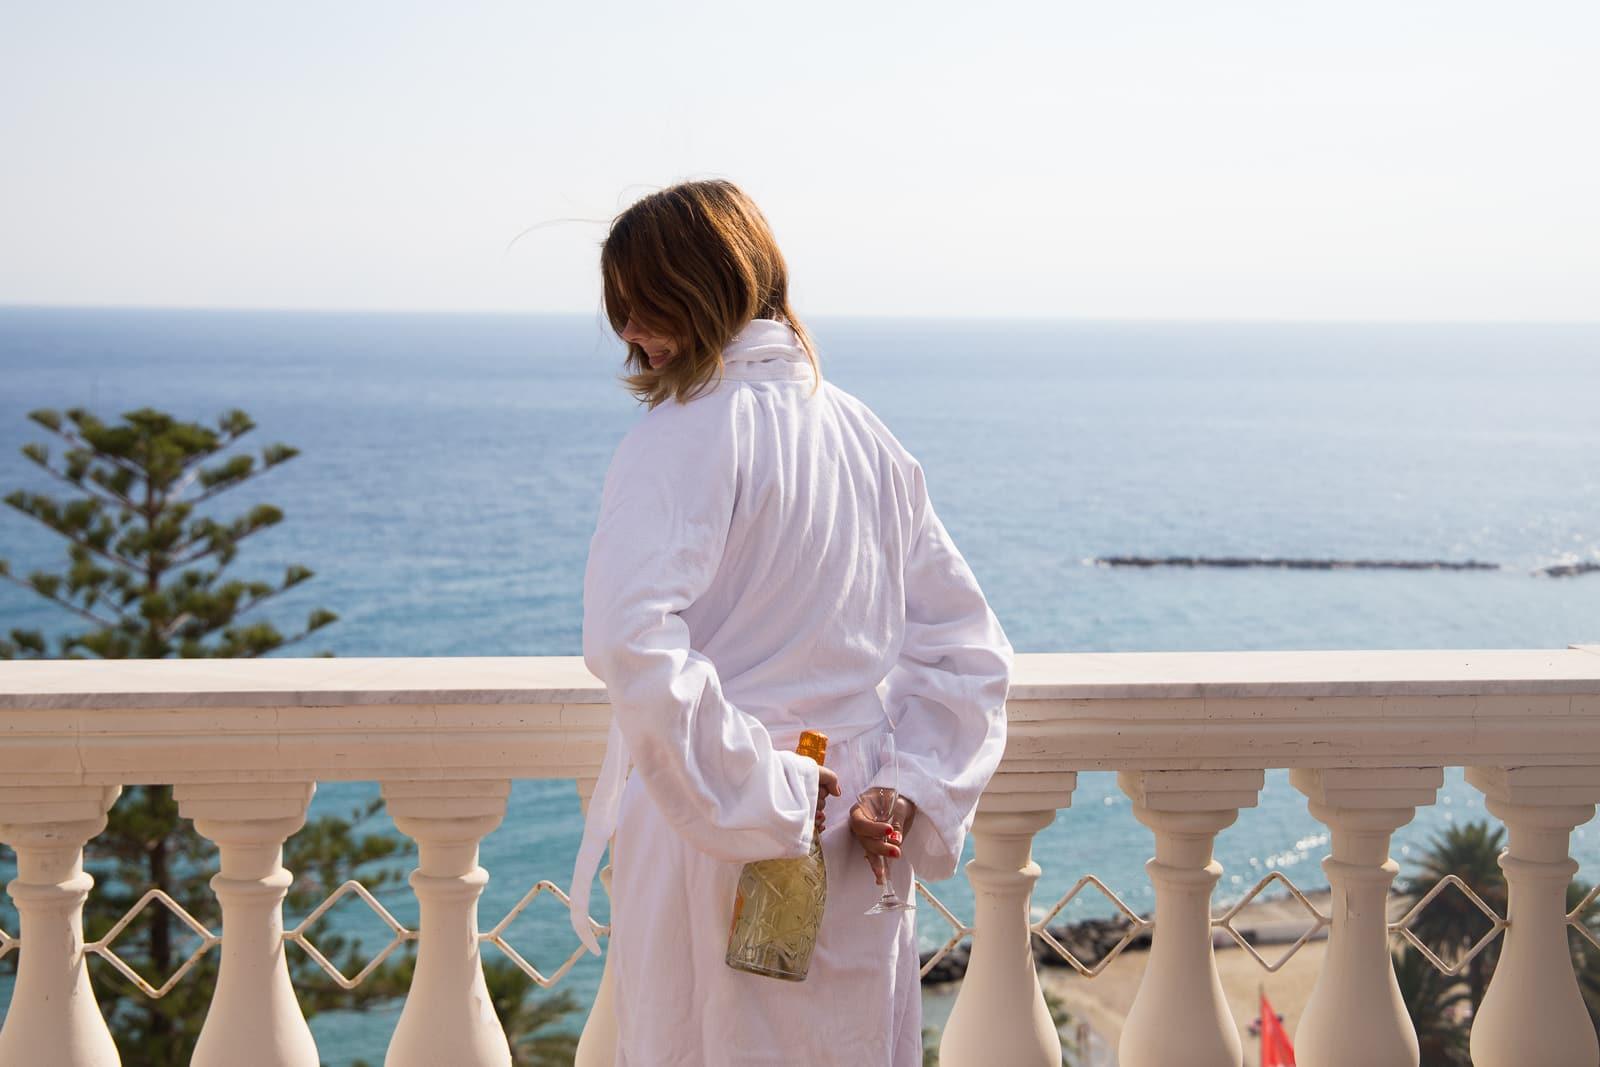 hotelbericht-royal-hotel-sanremo-5-sterne-luxus-reise-reise-blog-des-belles-choses-17